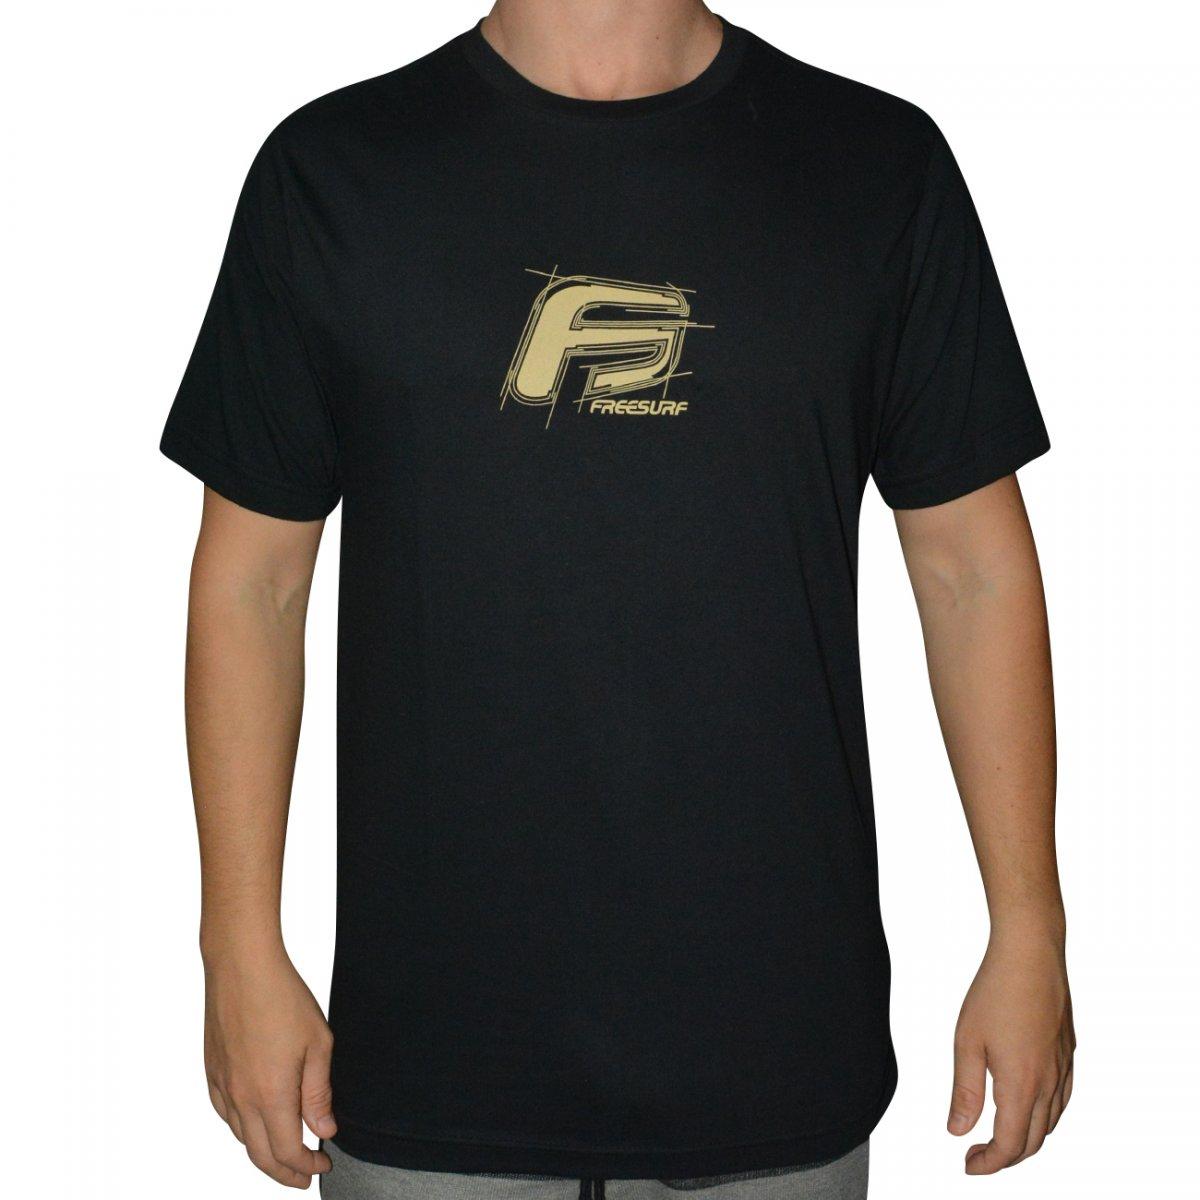 36def53b77d16 Camiseta Free Surf Surf 110409059 - Preto - Chuteira Nike, Adidas.  Sandalias Femininas. Sandy Calçados